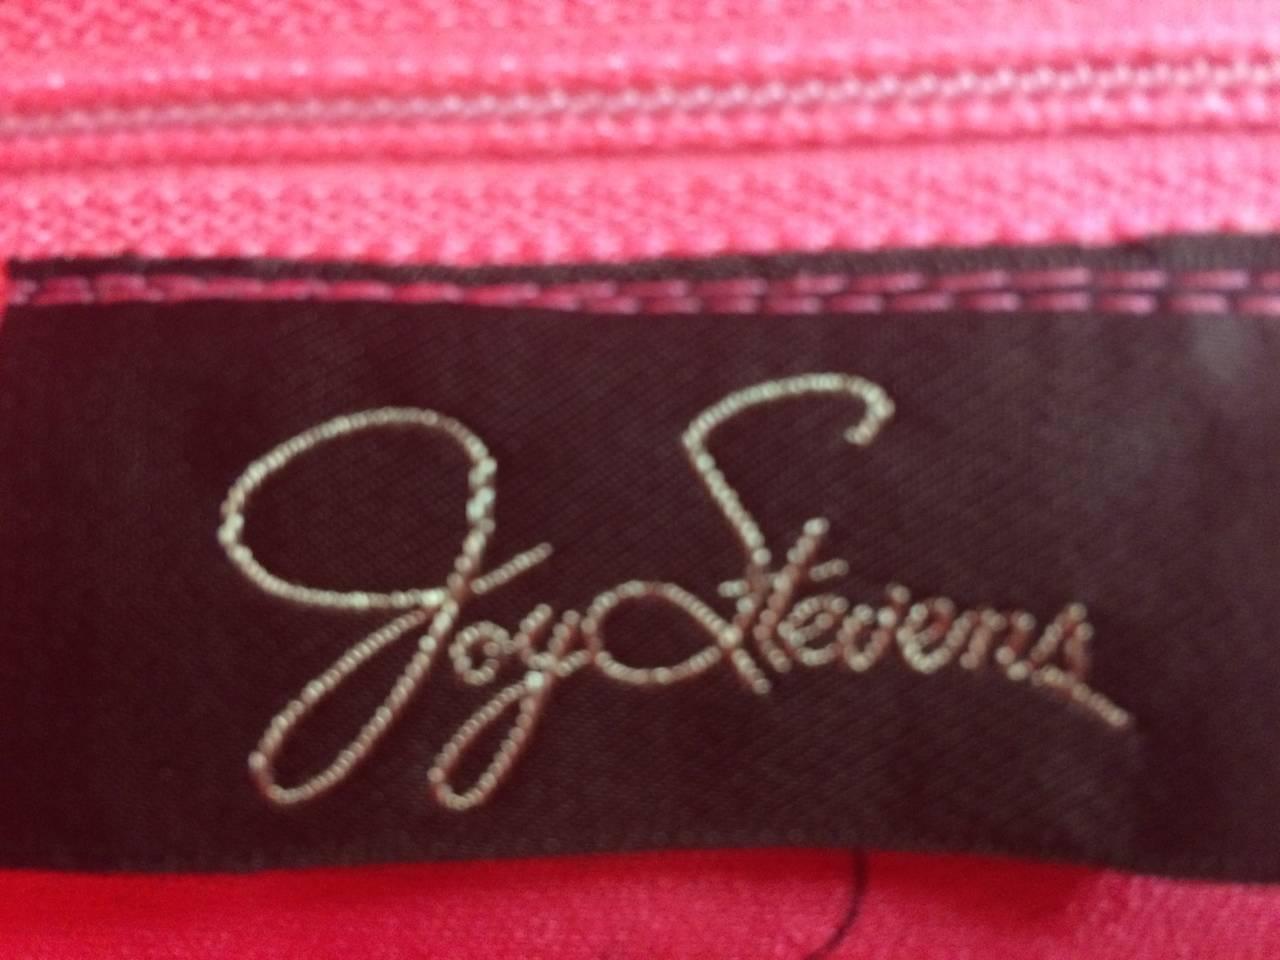 1970s Joy Stevens Coral Pink Maxi Dress For Sale 2